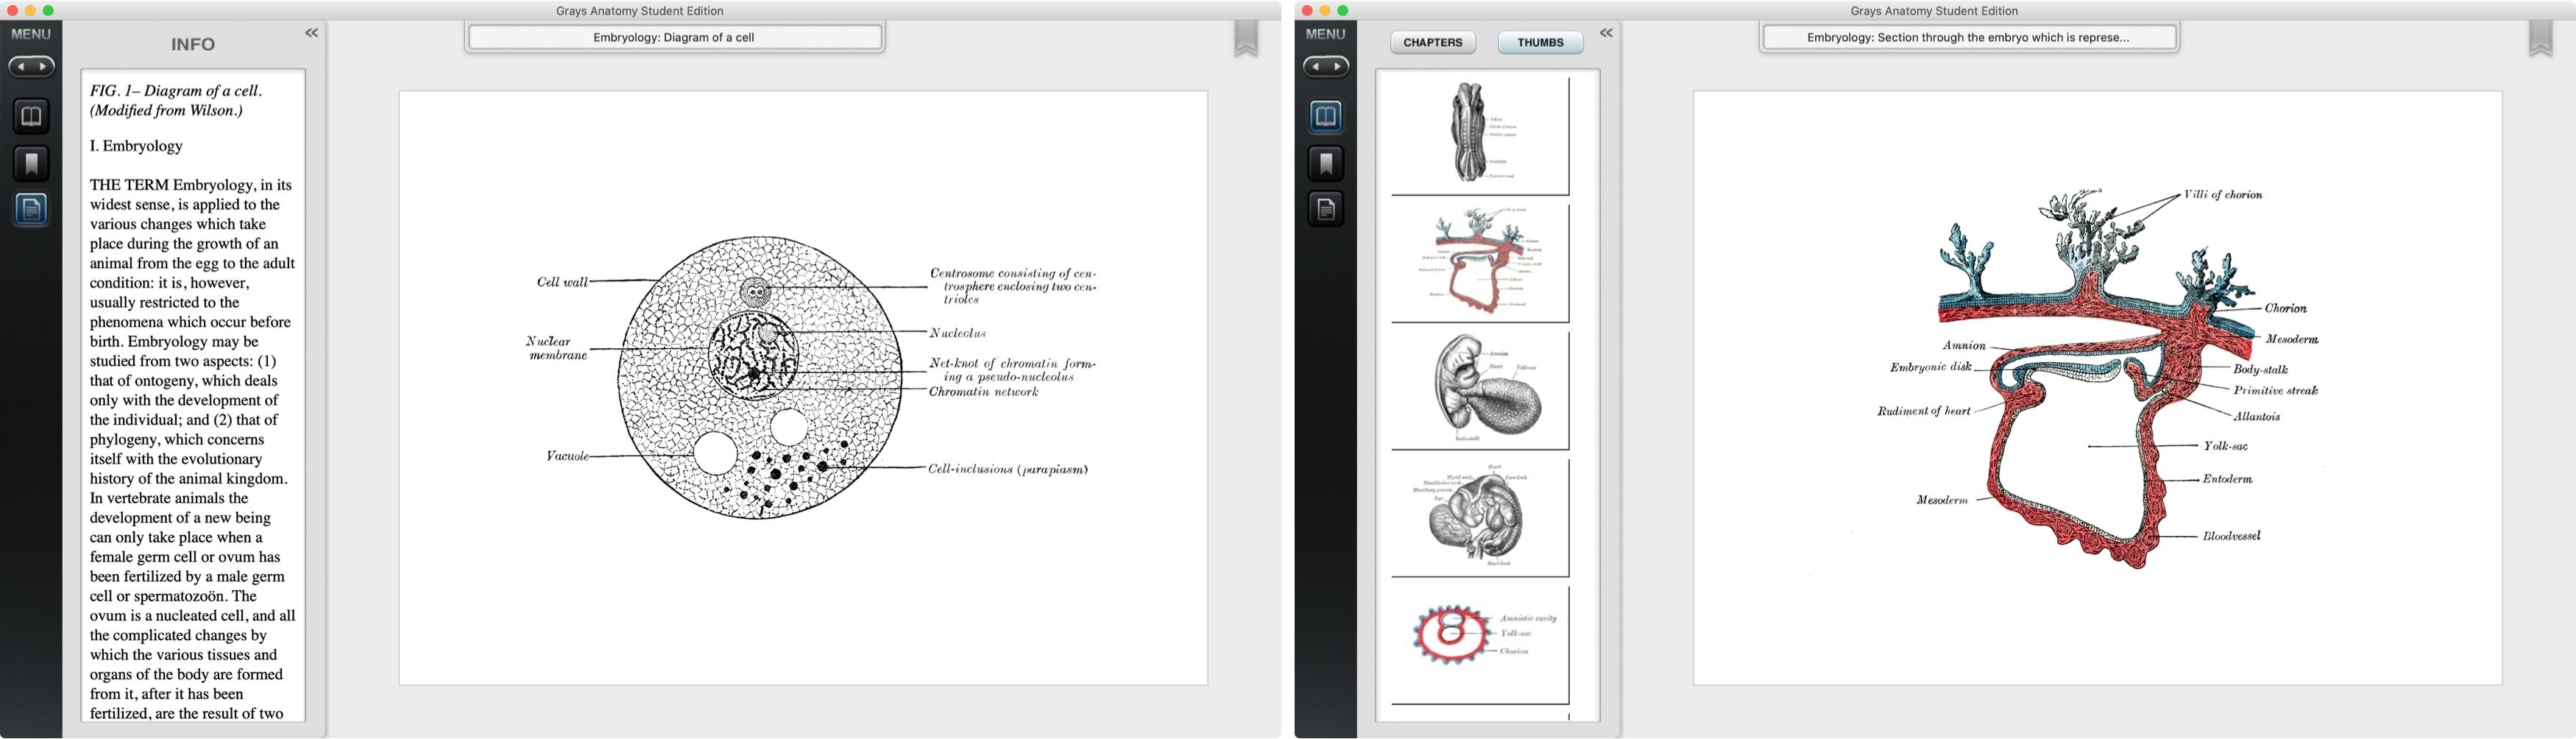 Grays Anatomy Student Edition Mac App